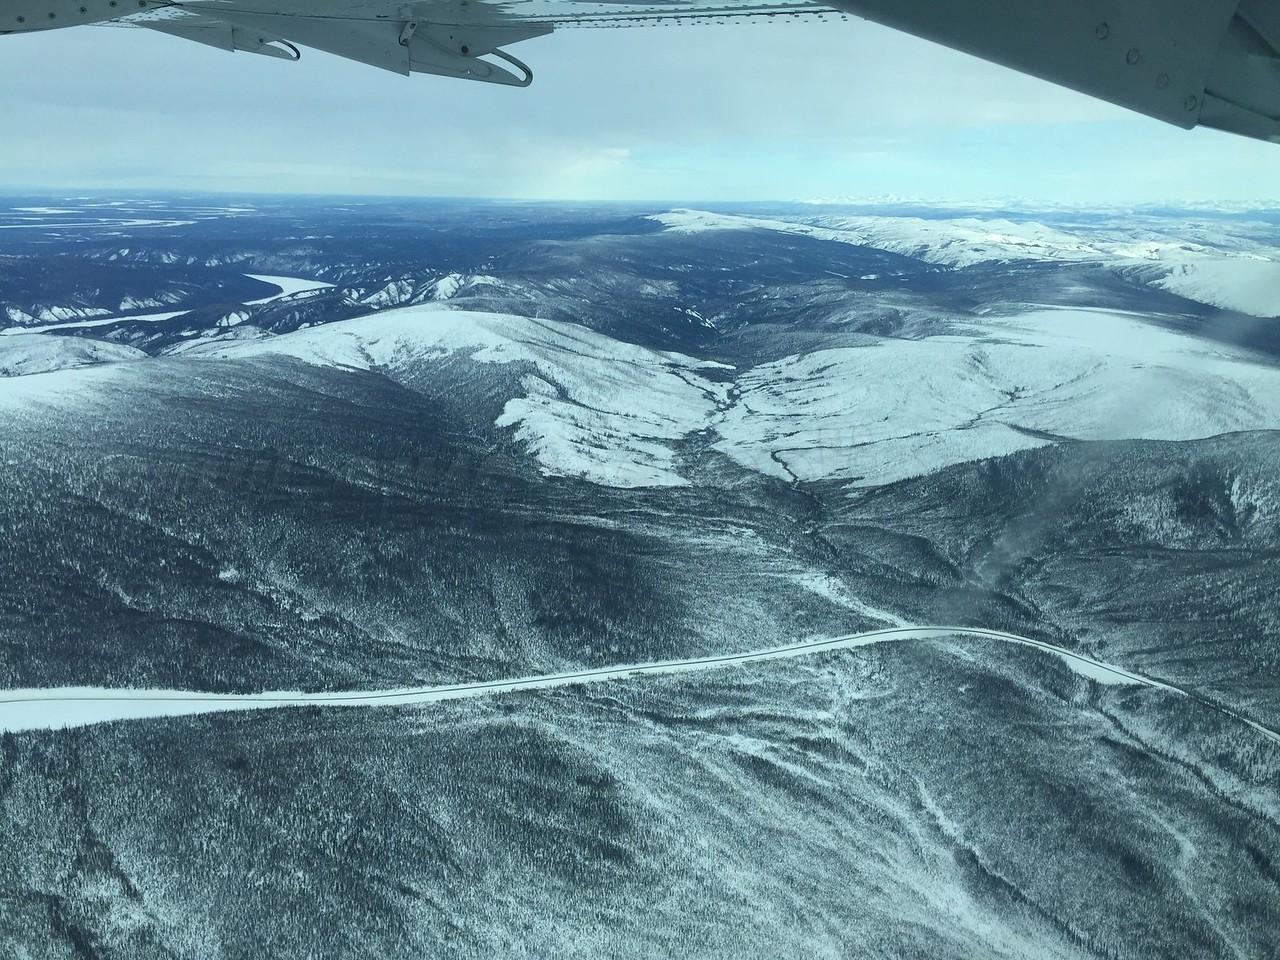 Yukon River and Dalton Highway